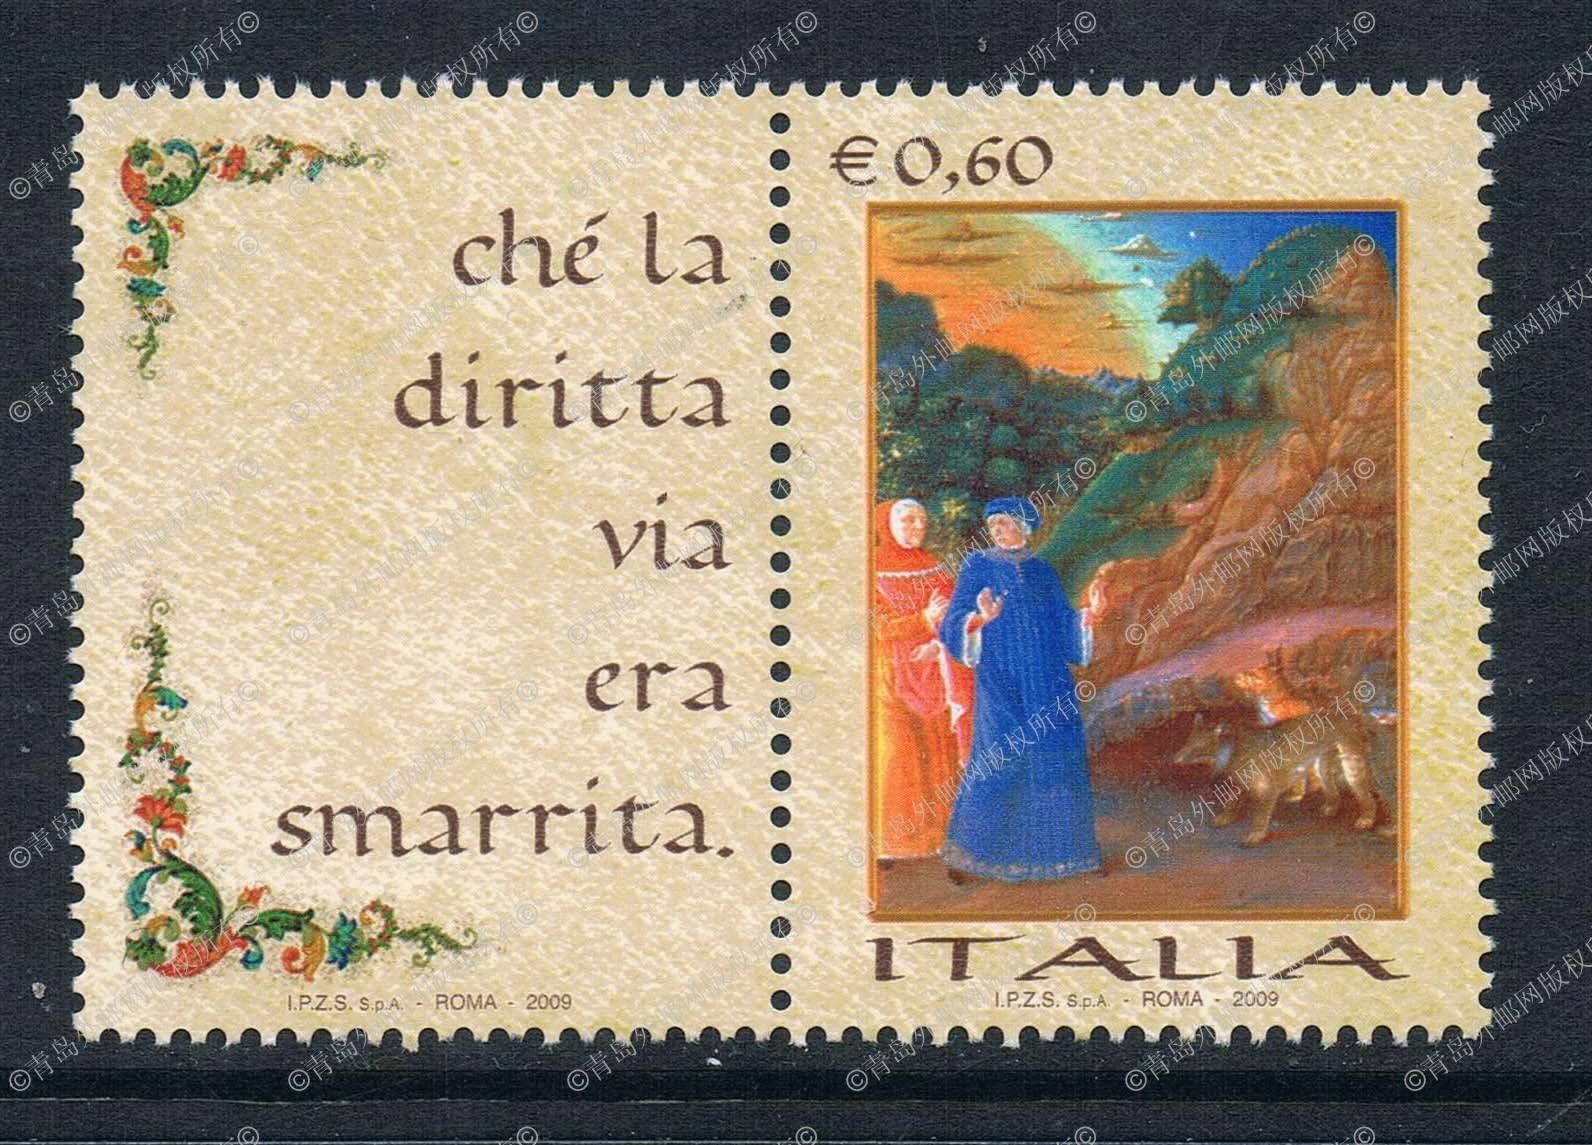 YT0170 Italy 2009 St. Ma Brahma three MediaTek 1 new 0629 Giotto painting помада sleek makeup lip v i p lipstick 1022 цвет 1022 name in lights variant hex name a93973